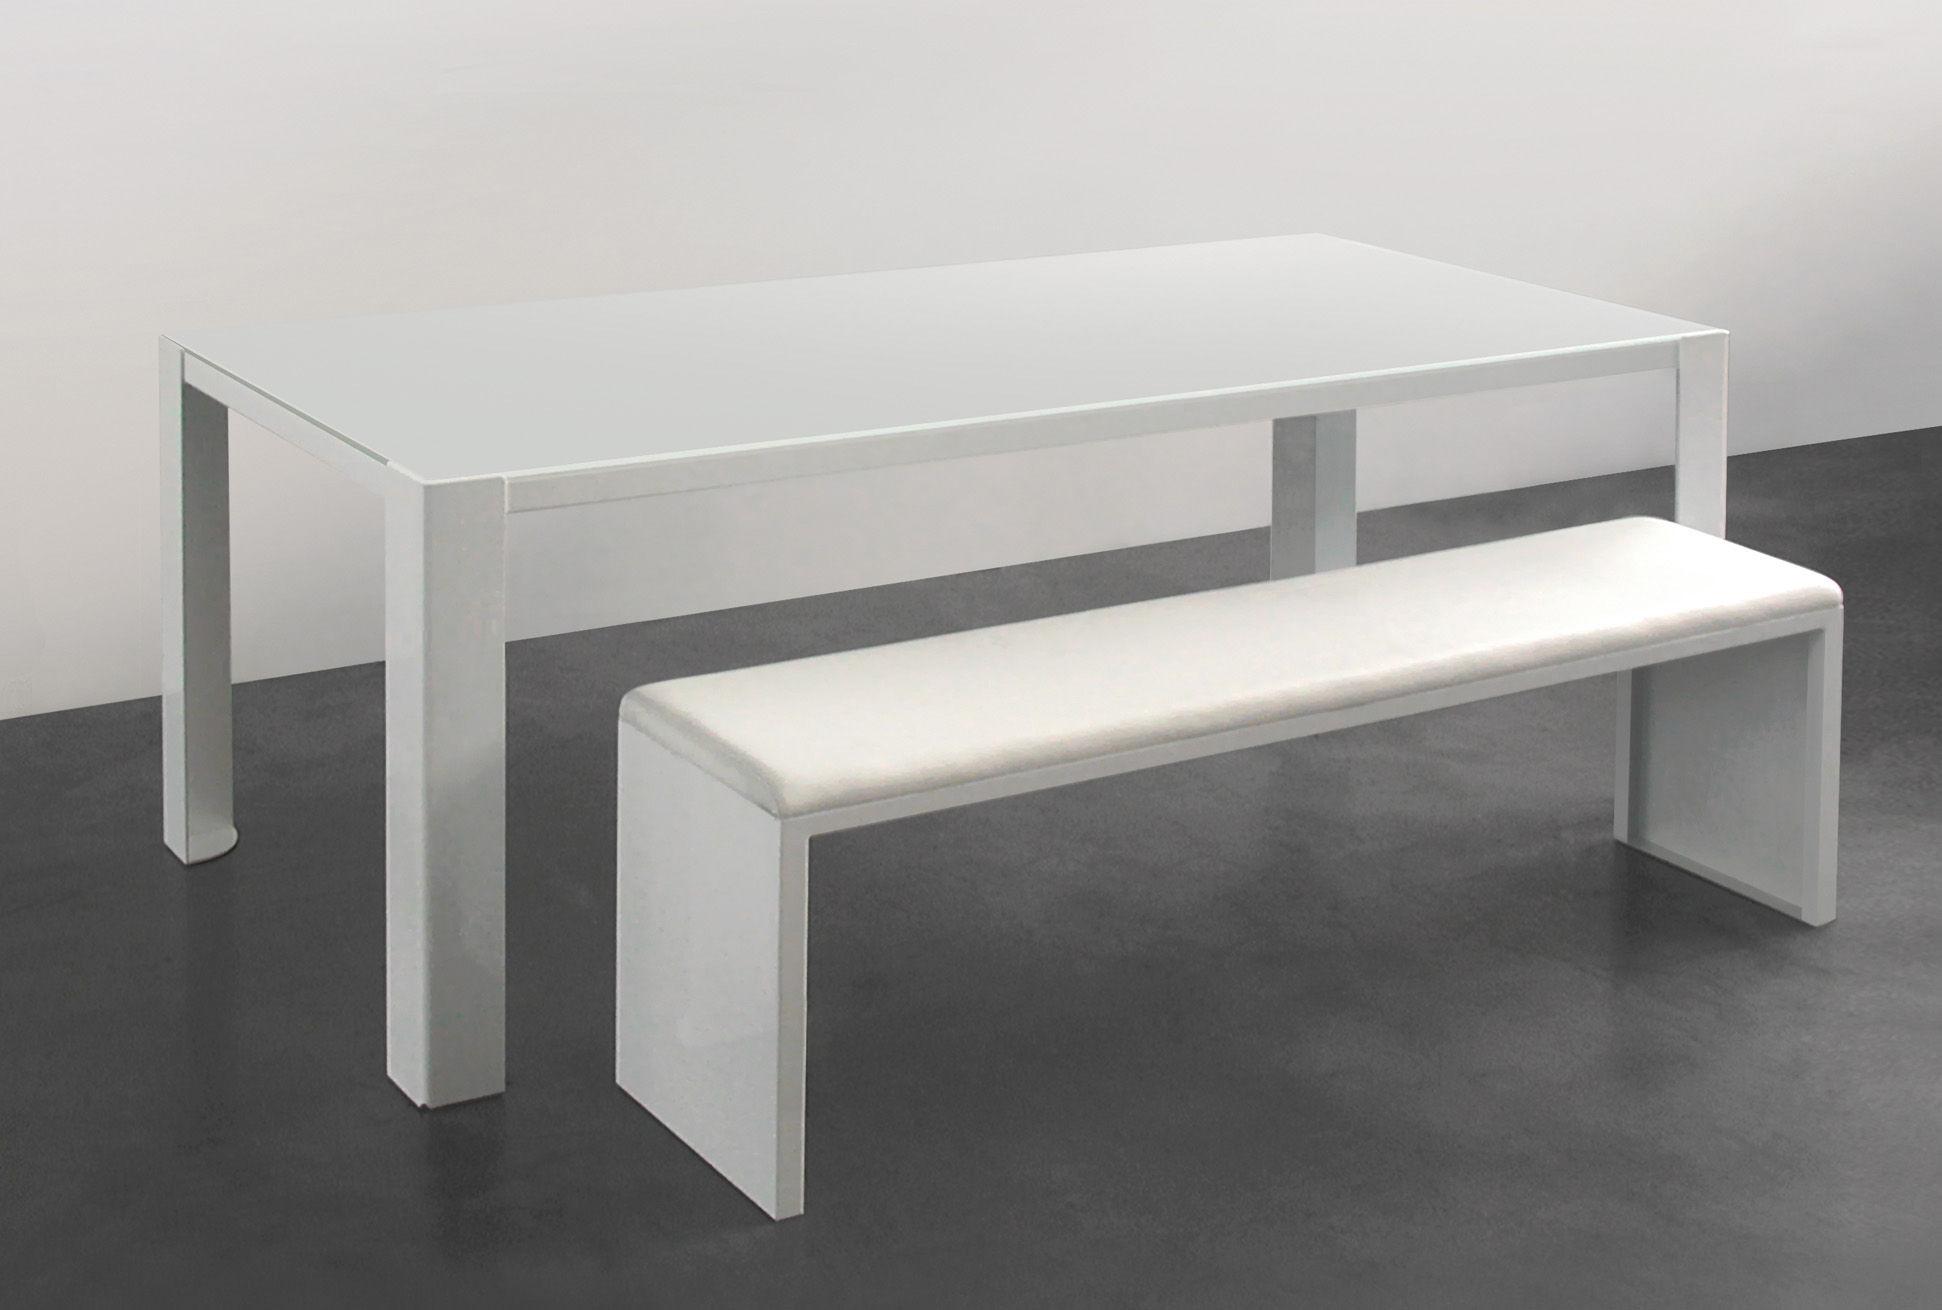 Big Irony White Glass Table White glass table top & white